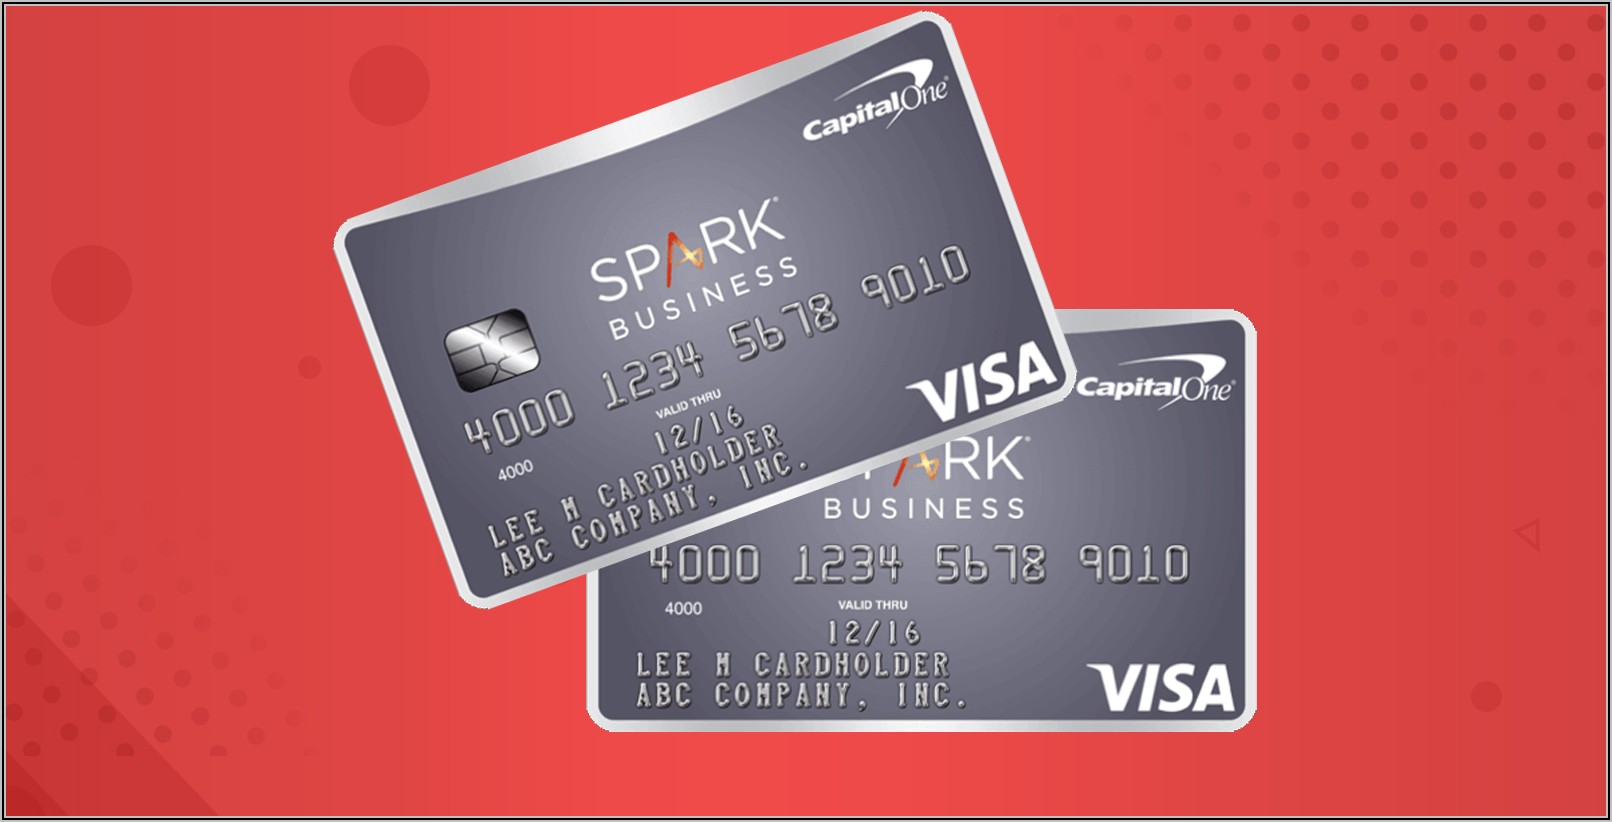 Capital One Business Card